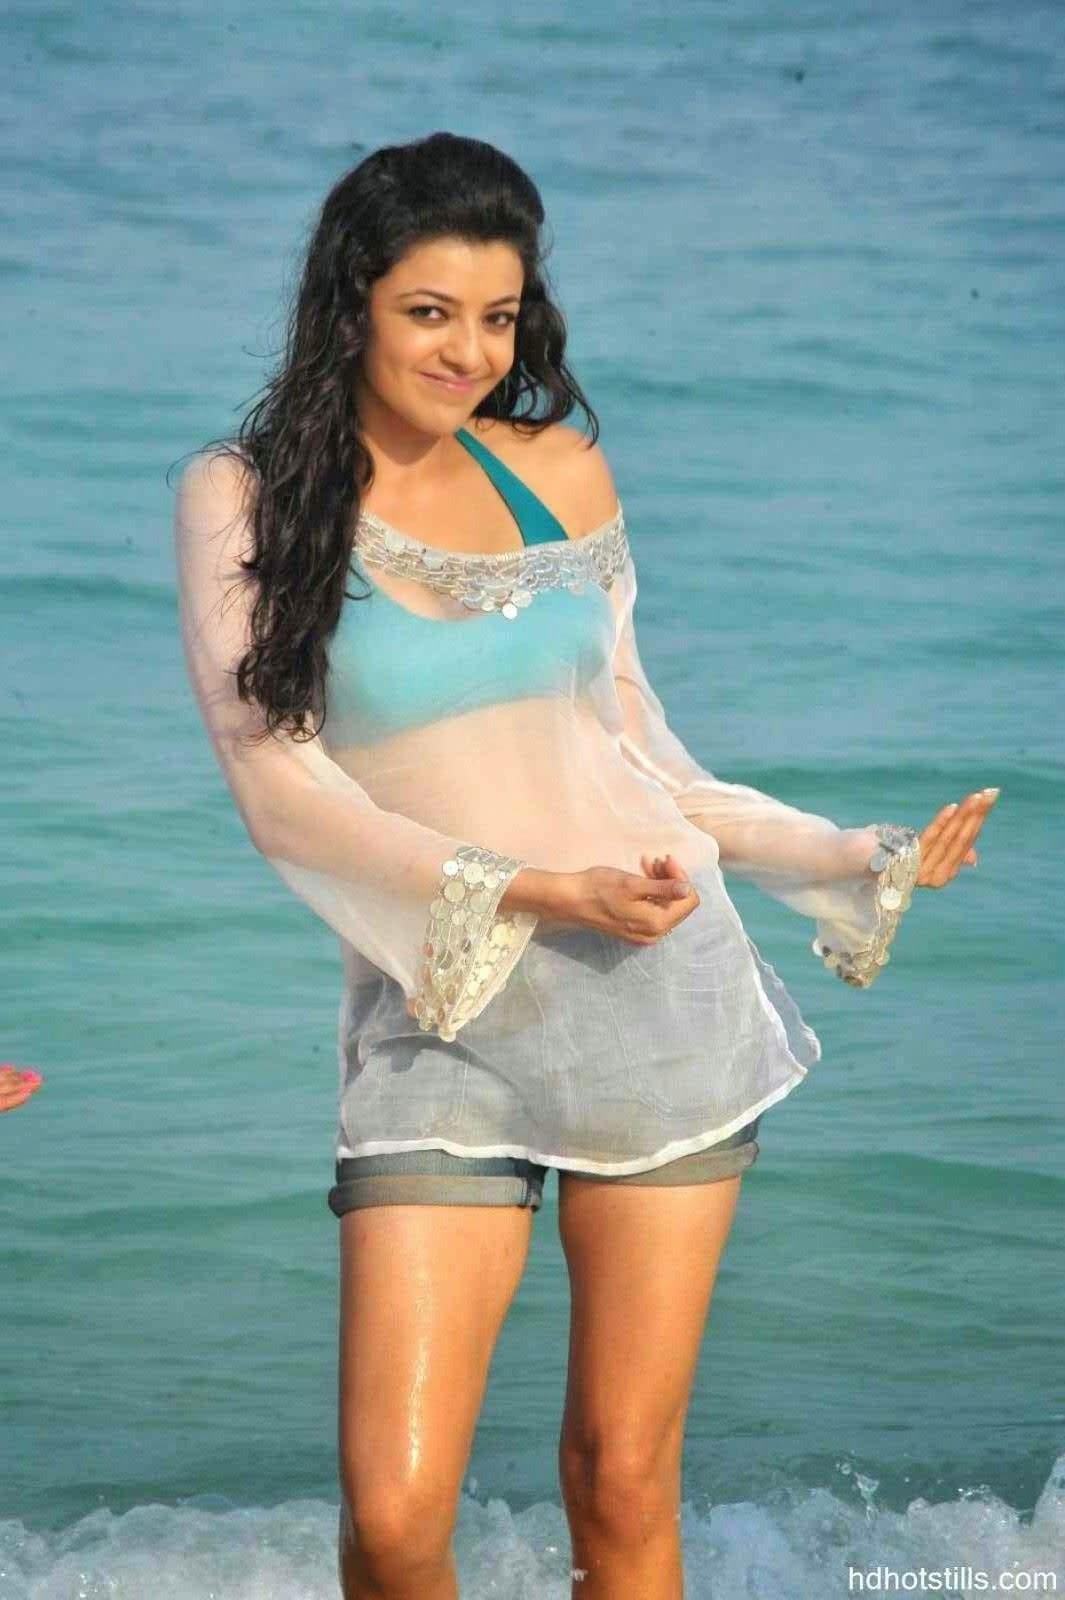 Kajal Aggarwal Most Beautiful Wet Dress Hot Photos and Wallpaper